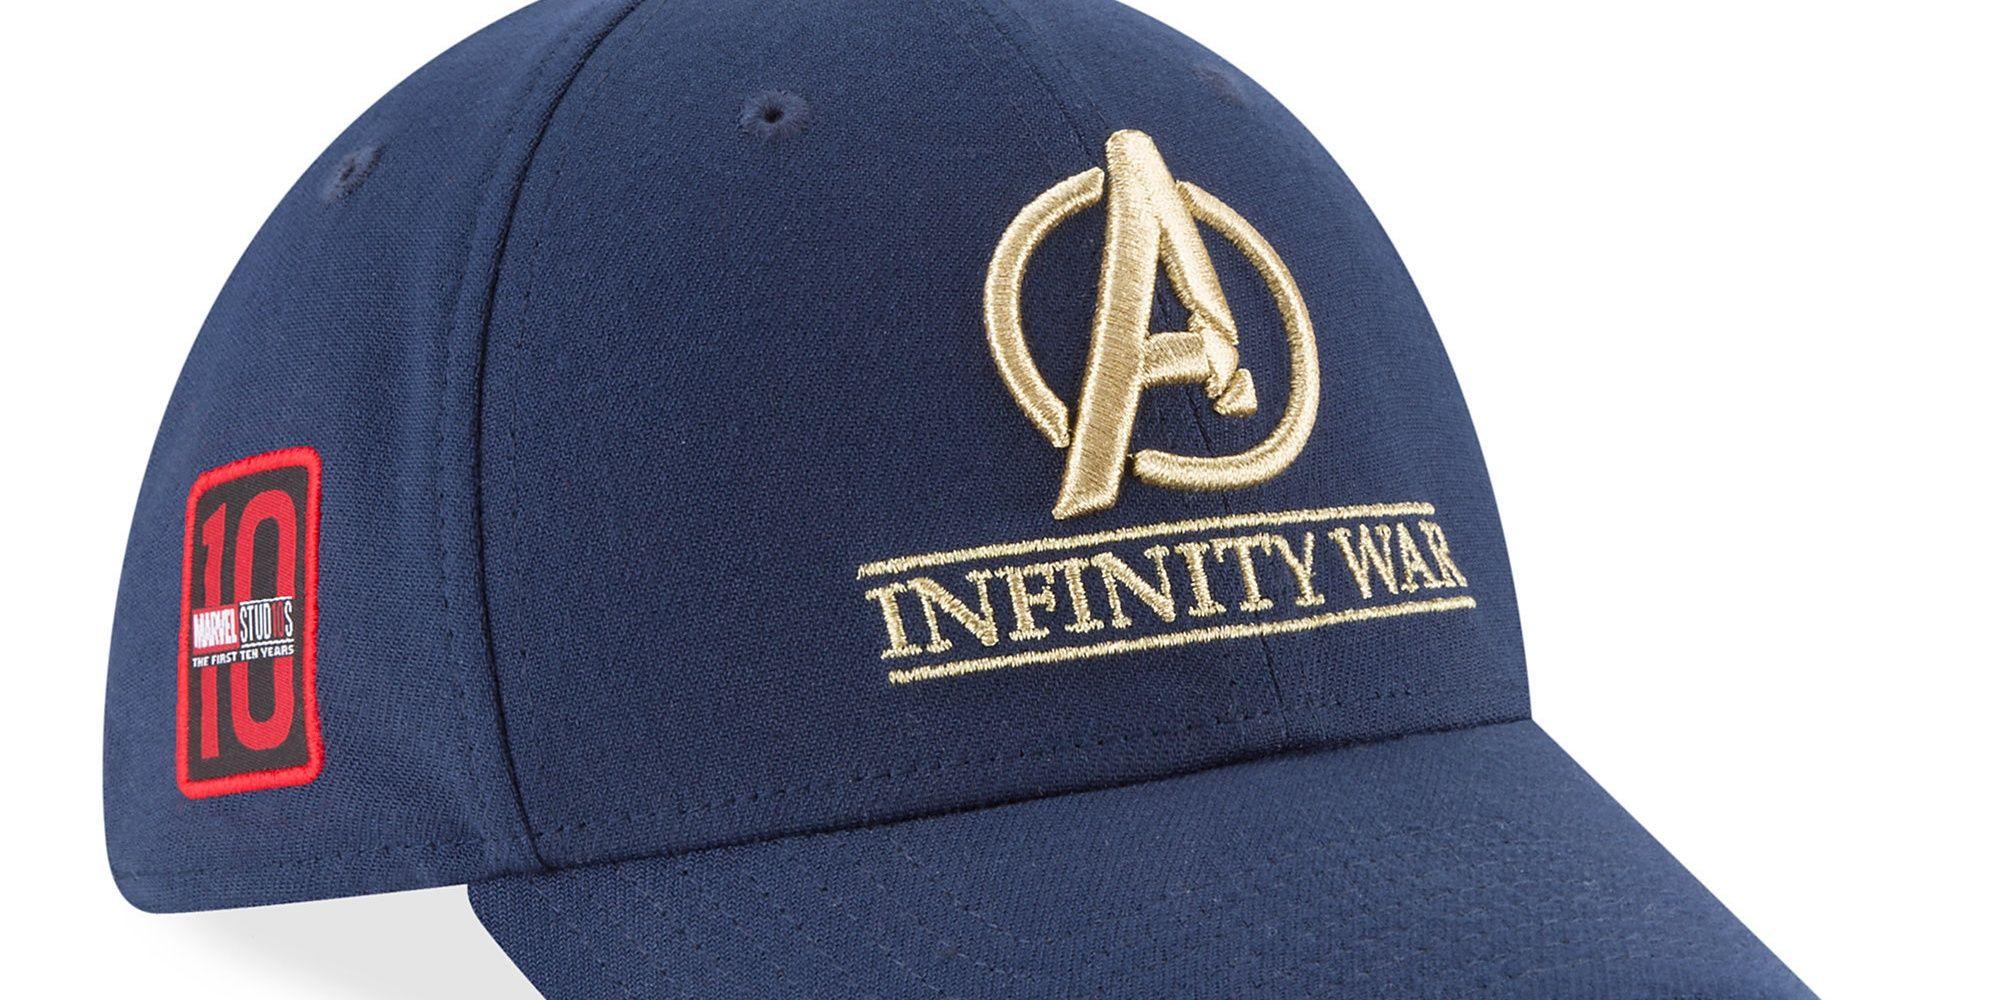 b9c7b949fce Marvel and Disney Selling Official Avengers  Infinity War Film Crew  Baseball Cap